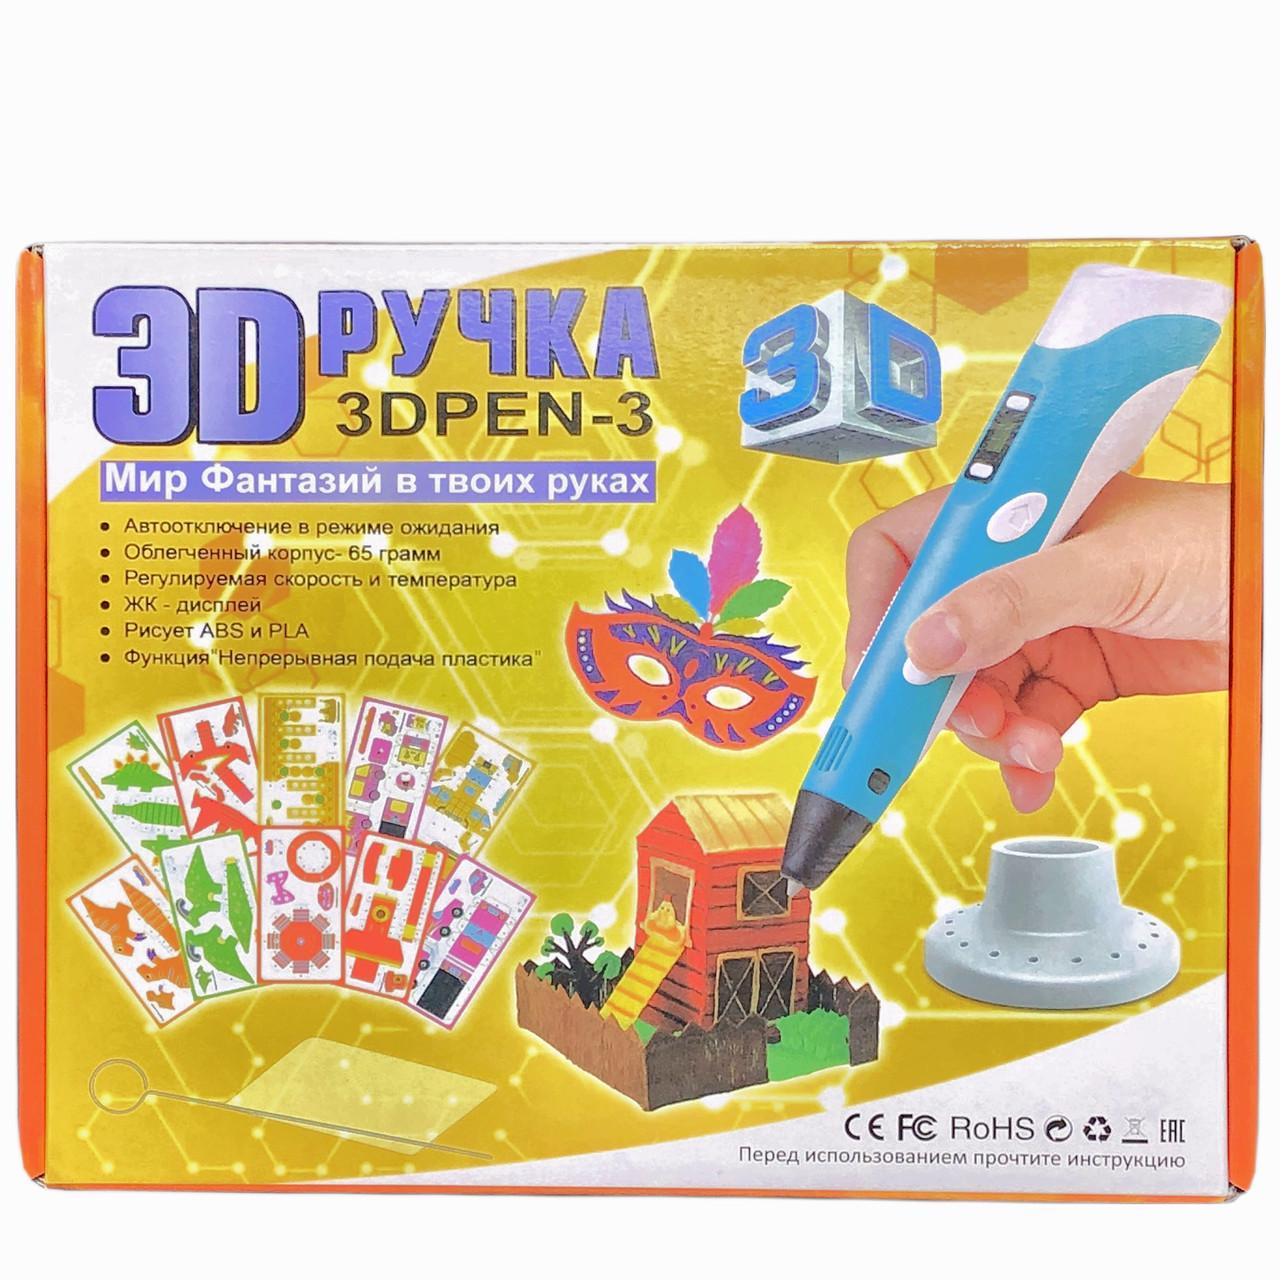 3D-ручка с трафаретами, 3D Pen-3 c LCD дисплеем голубая